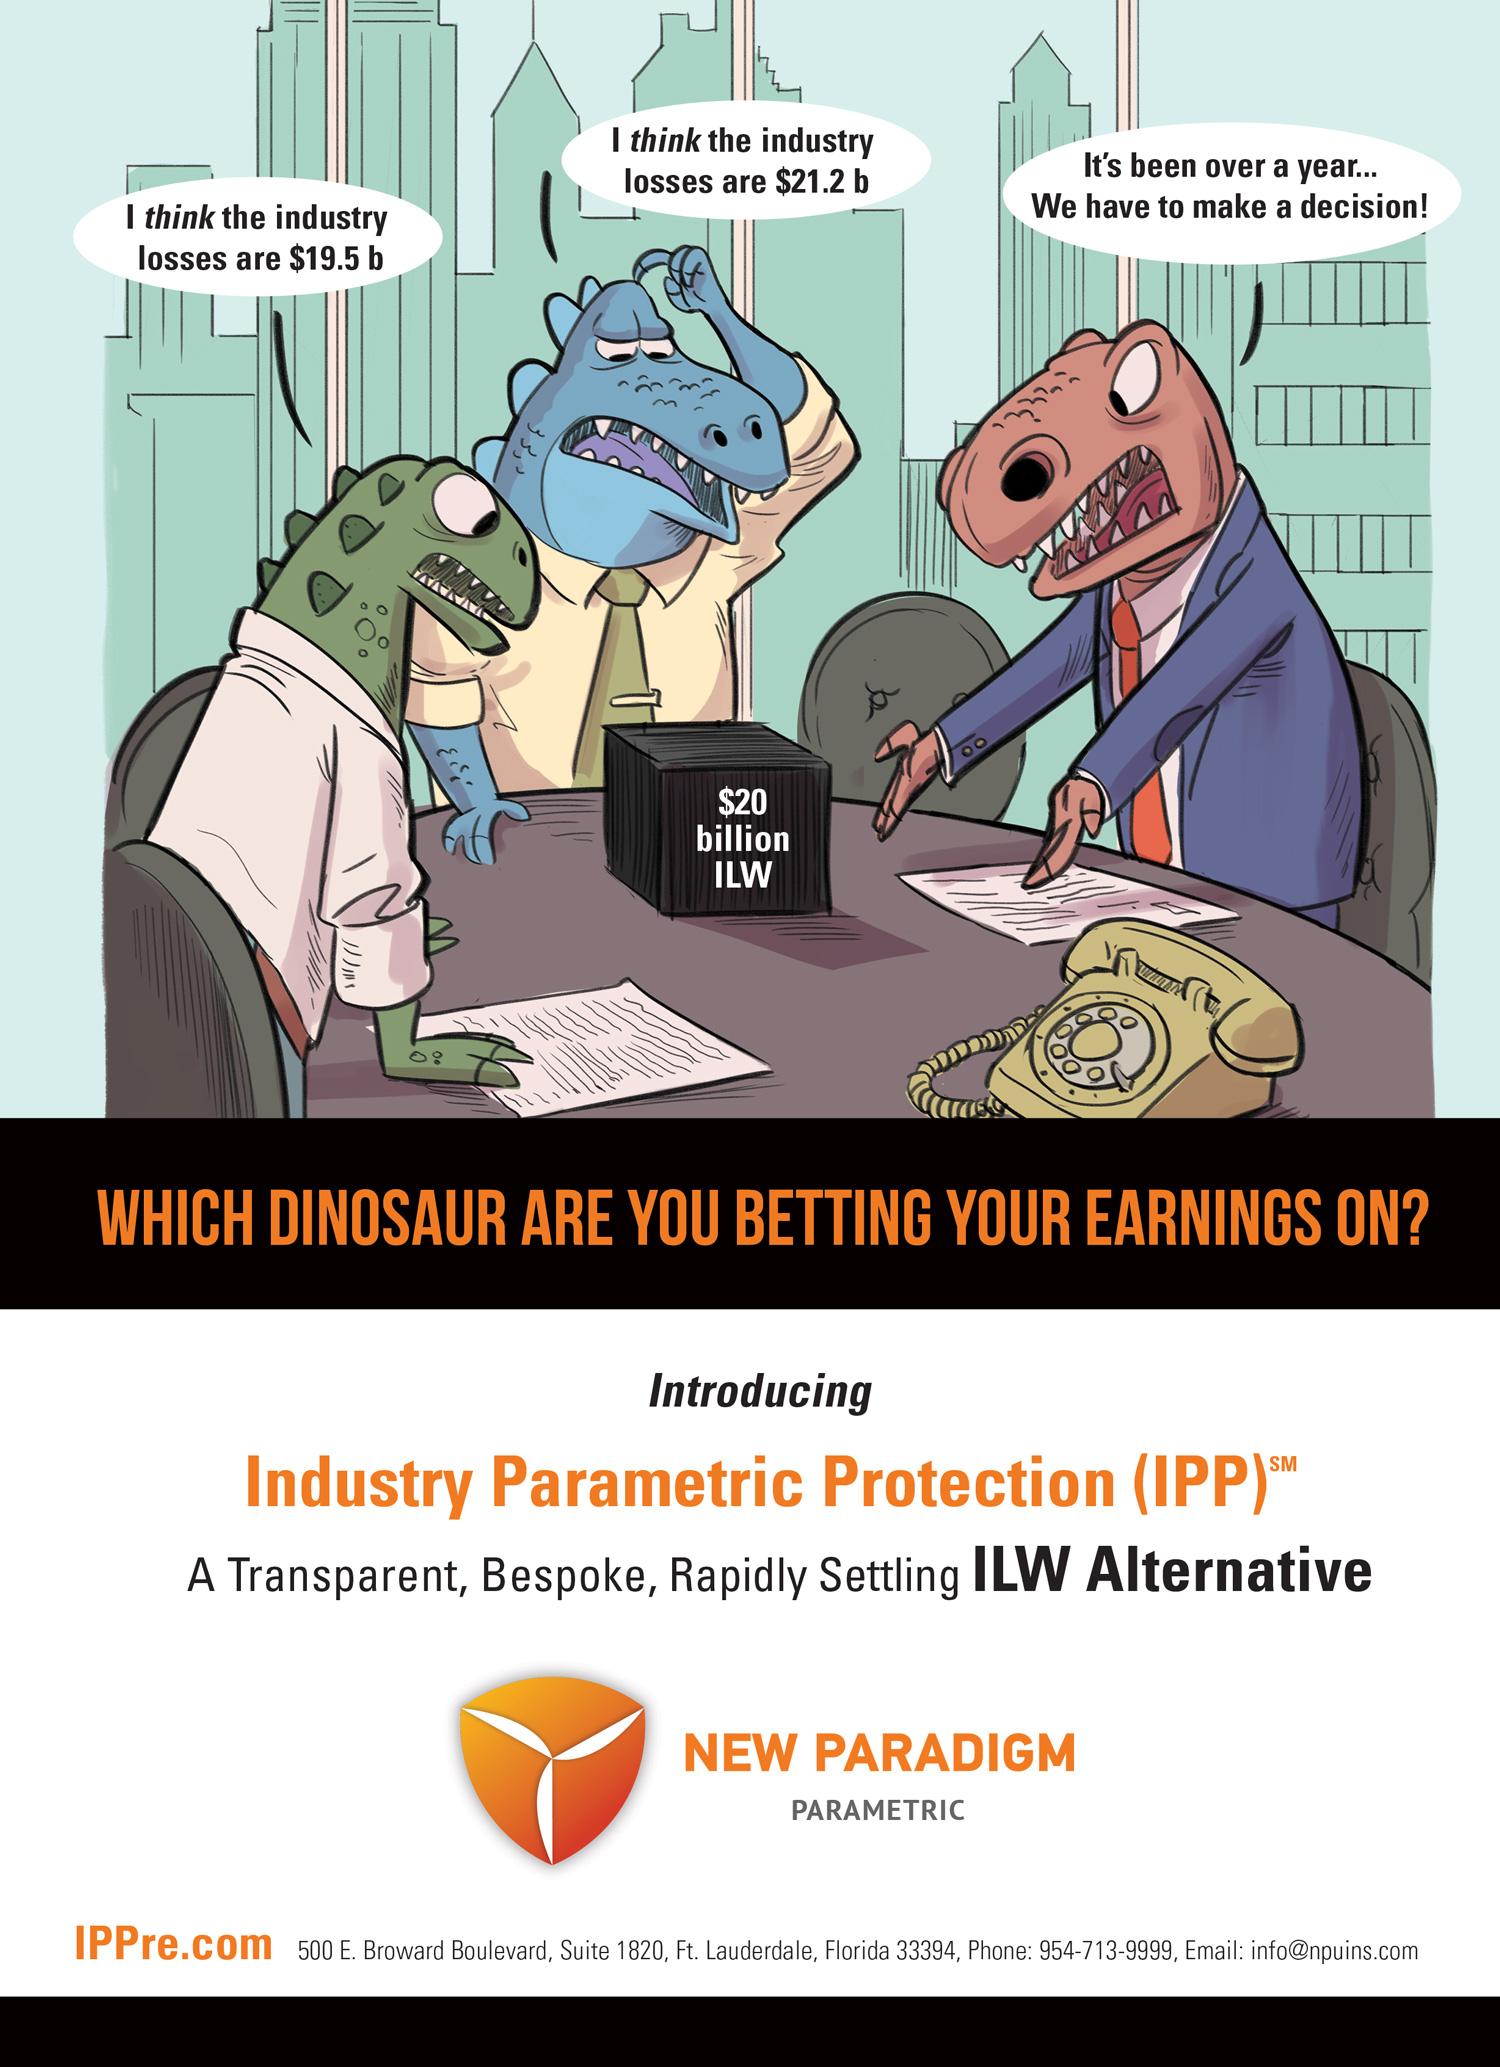 New Paradigm Parametric Insurance